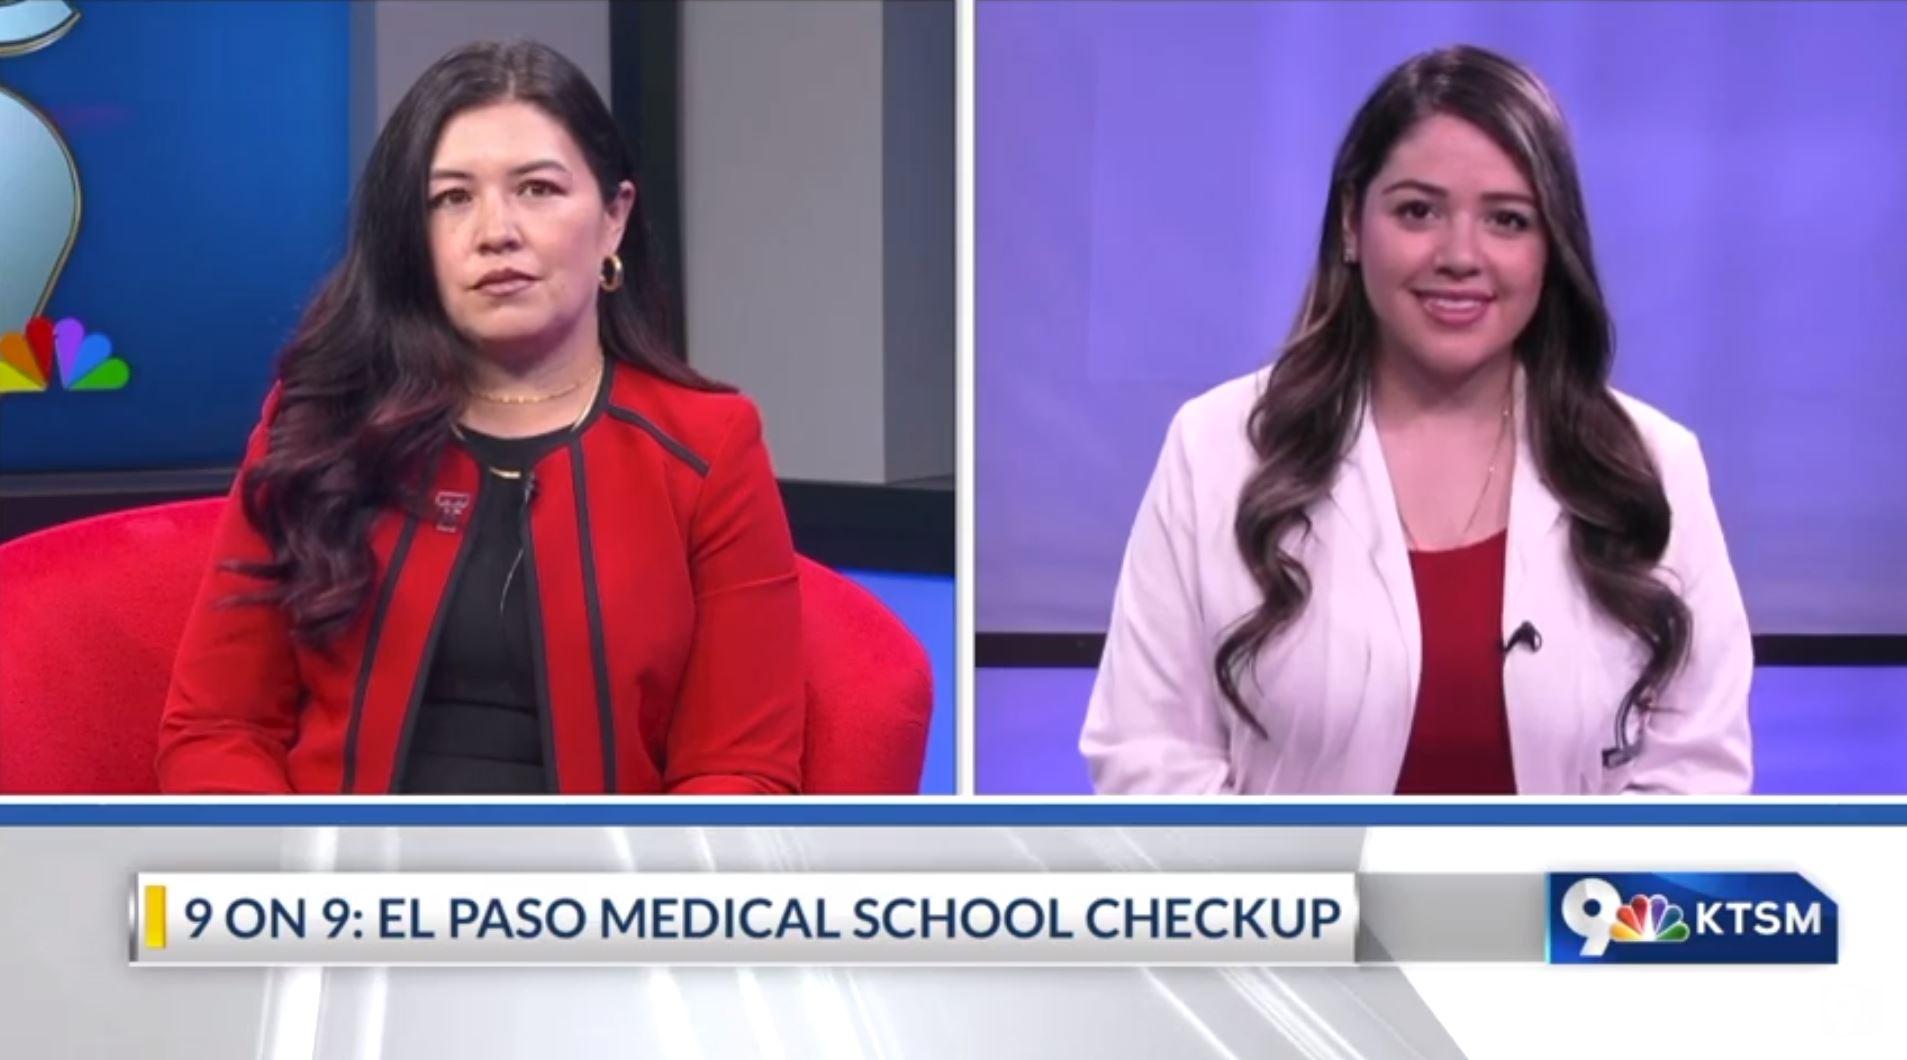 Texas Tech School of Medicine officials discuss medical needs in El Paso.